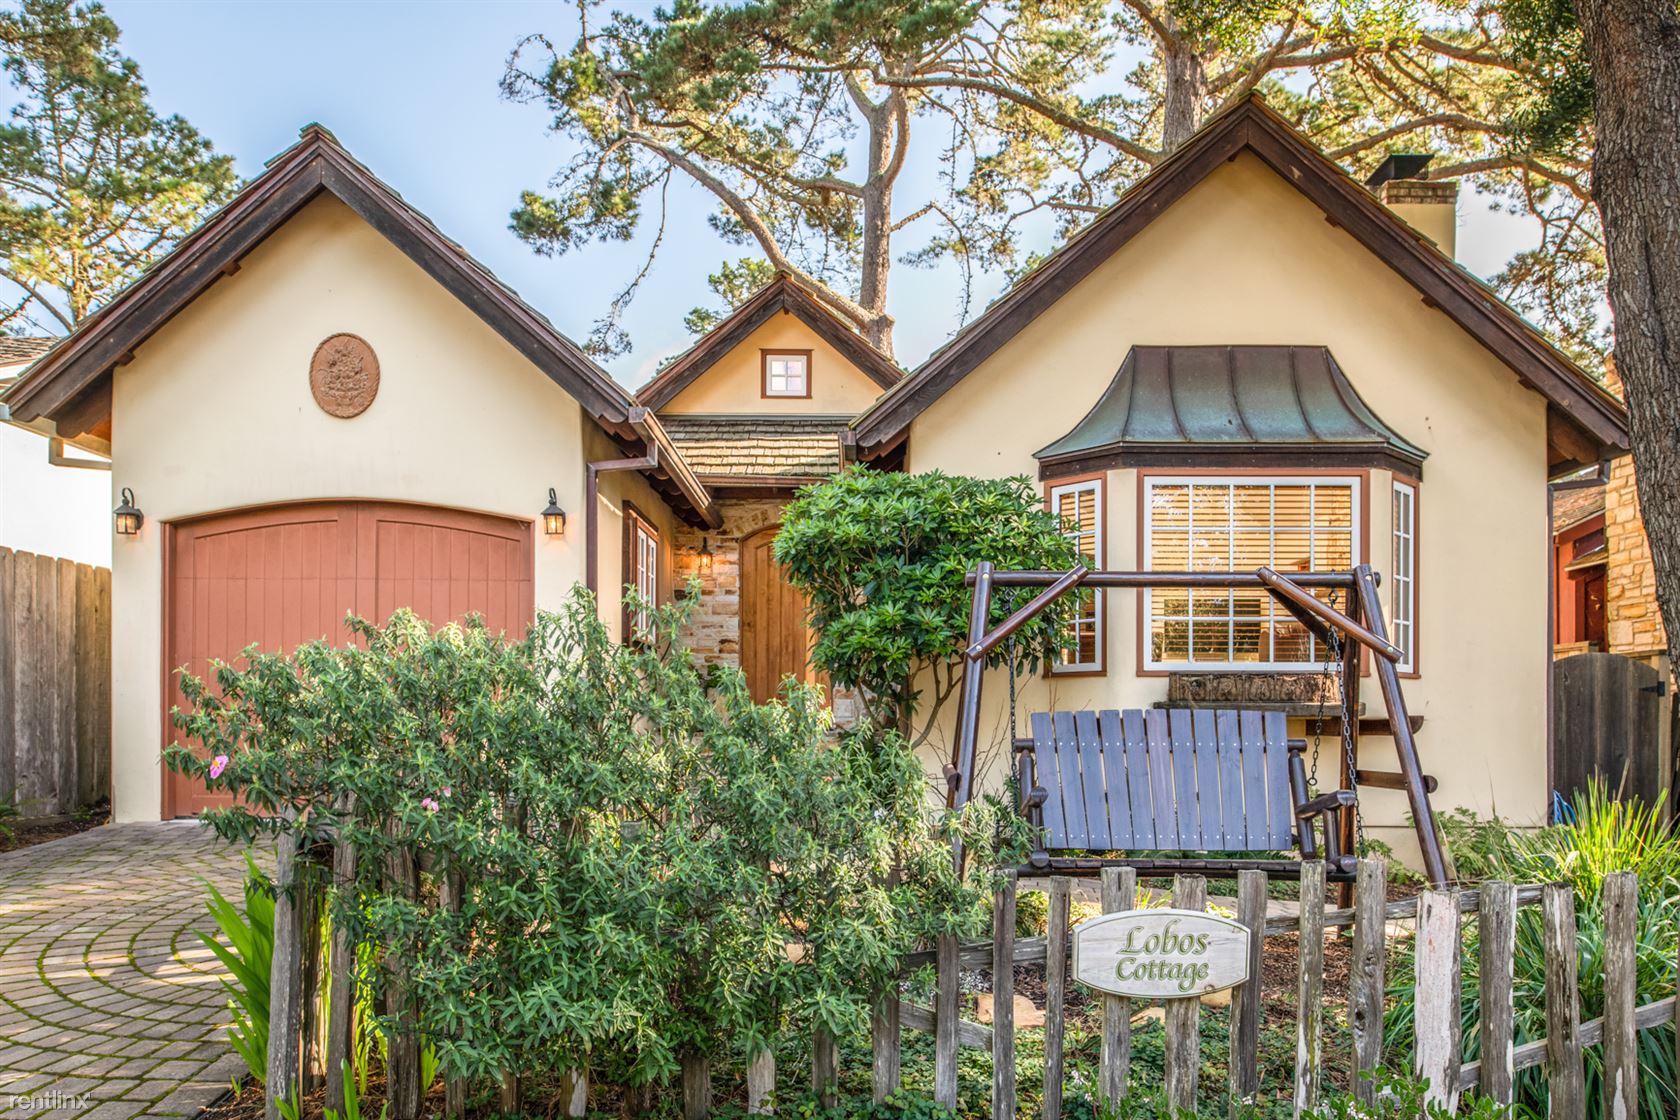 Lobos 2 SE of 2nd Avenue, Carmel-by-the-Sea, CA - $5,500